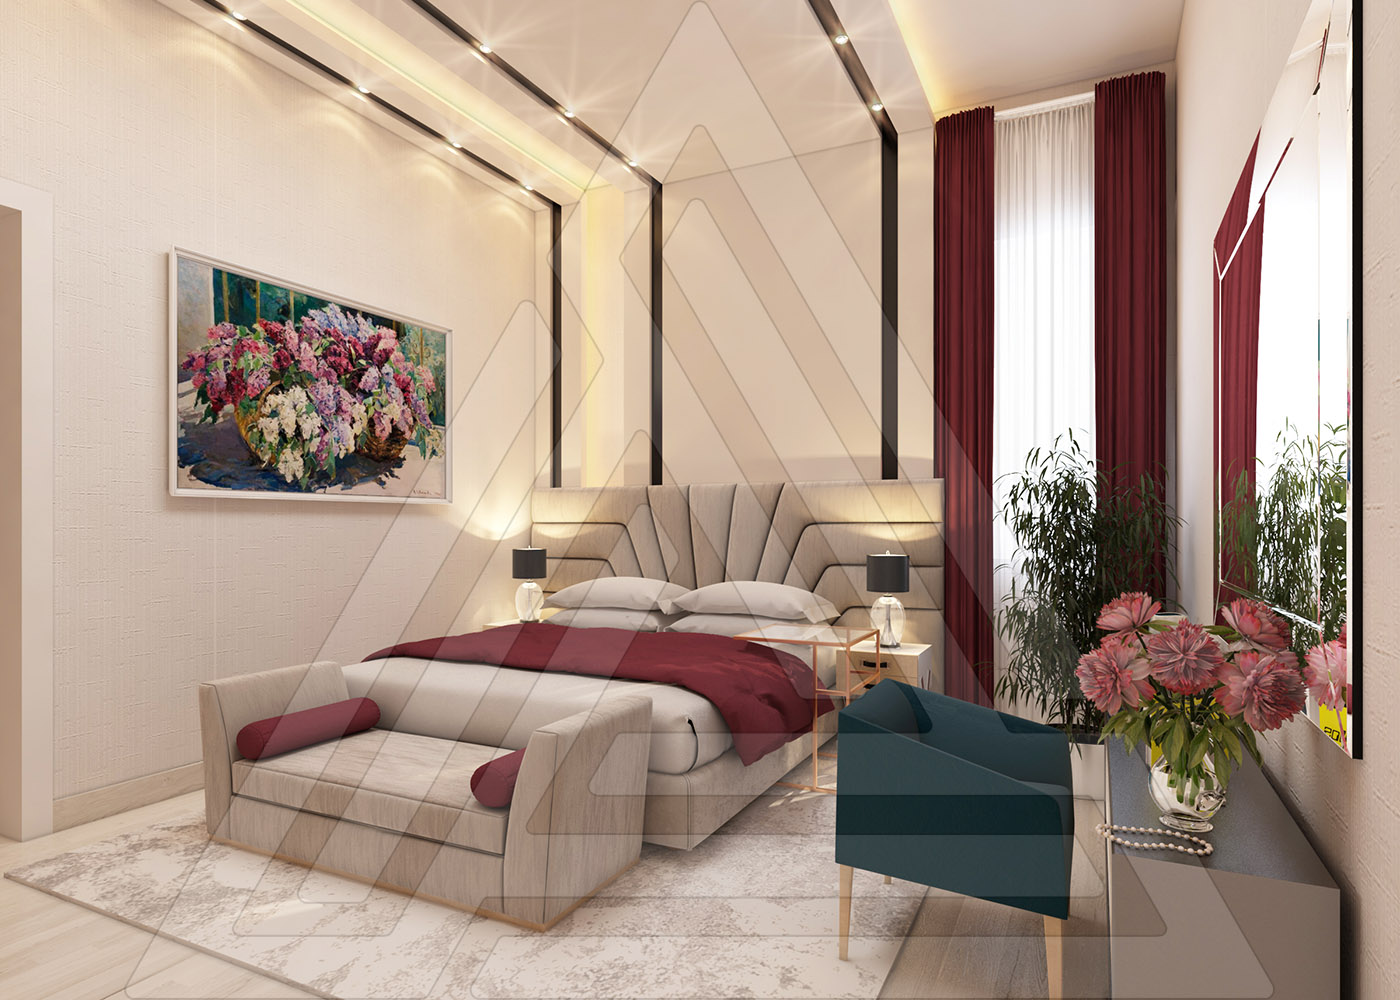 bed room 9 (11)